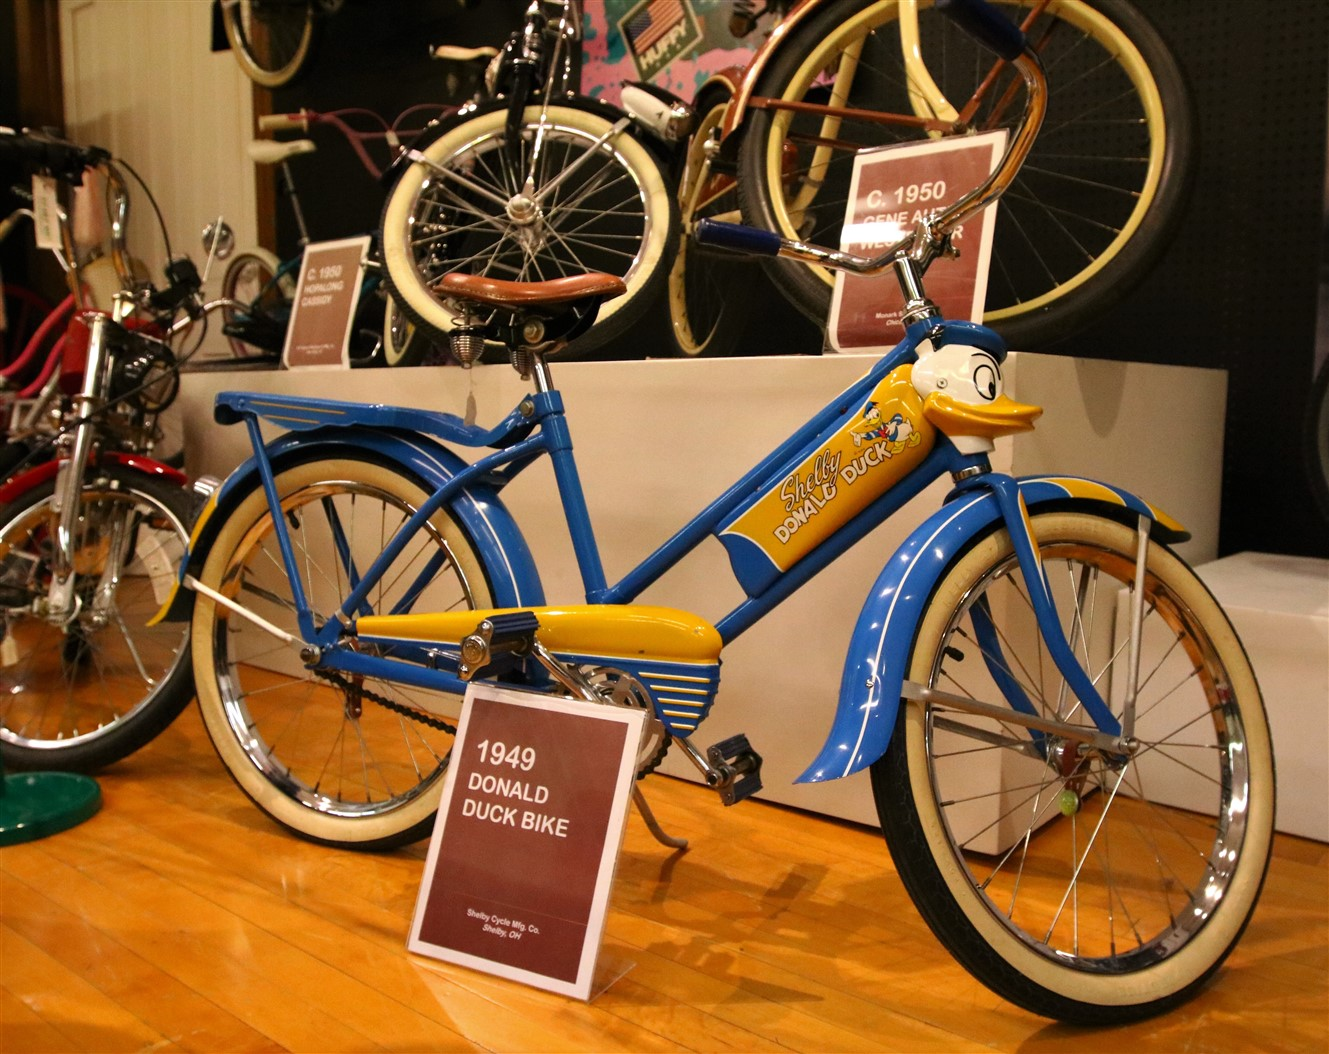 2017 03 18 76 New Bremen OH Bicycle Museum of America.jpg